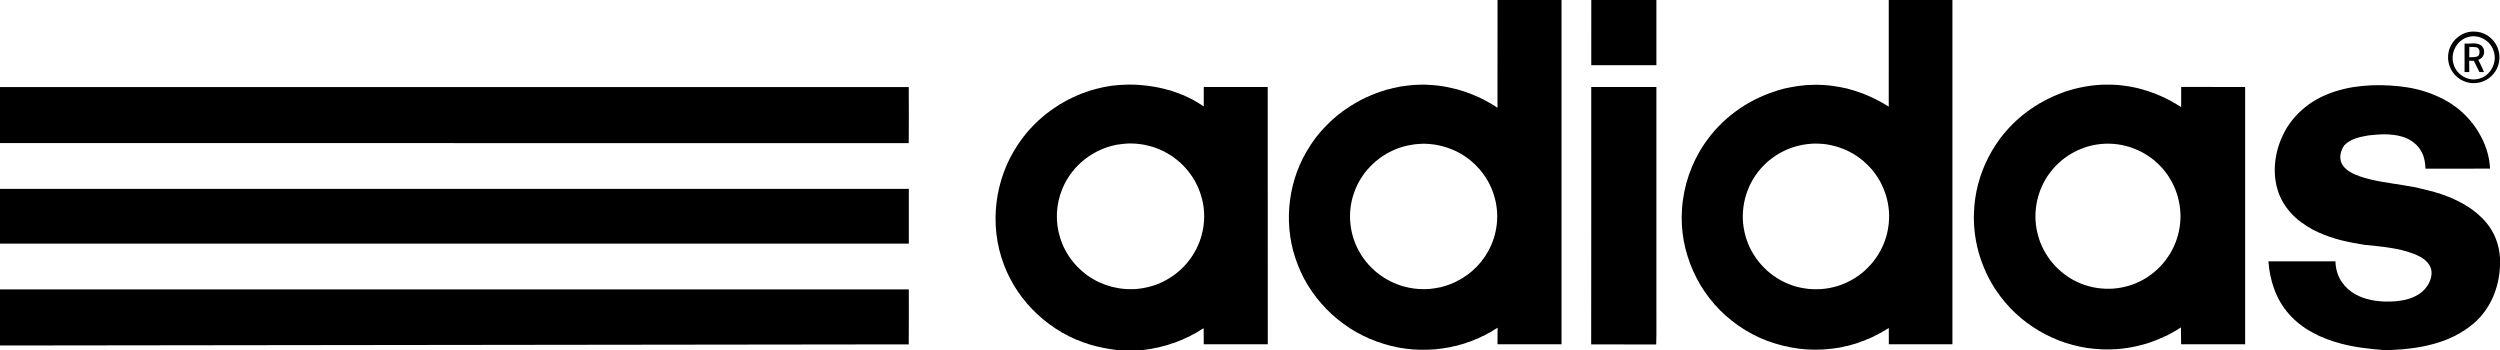 Adidas clipart transparent Image with Adidas transparent logo